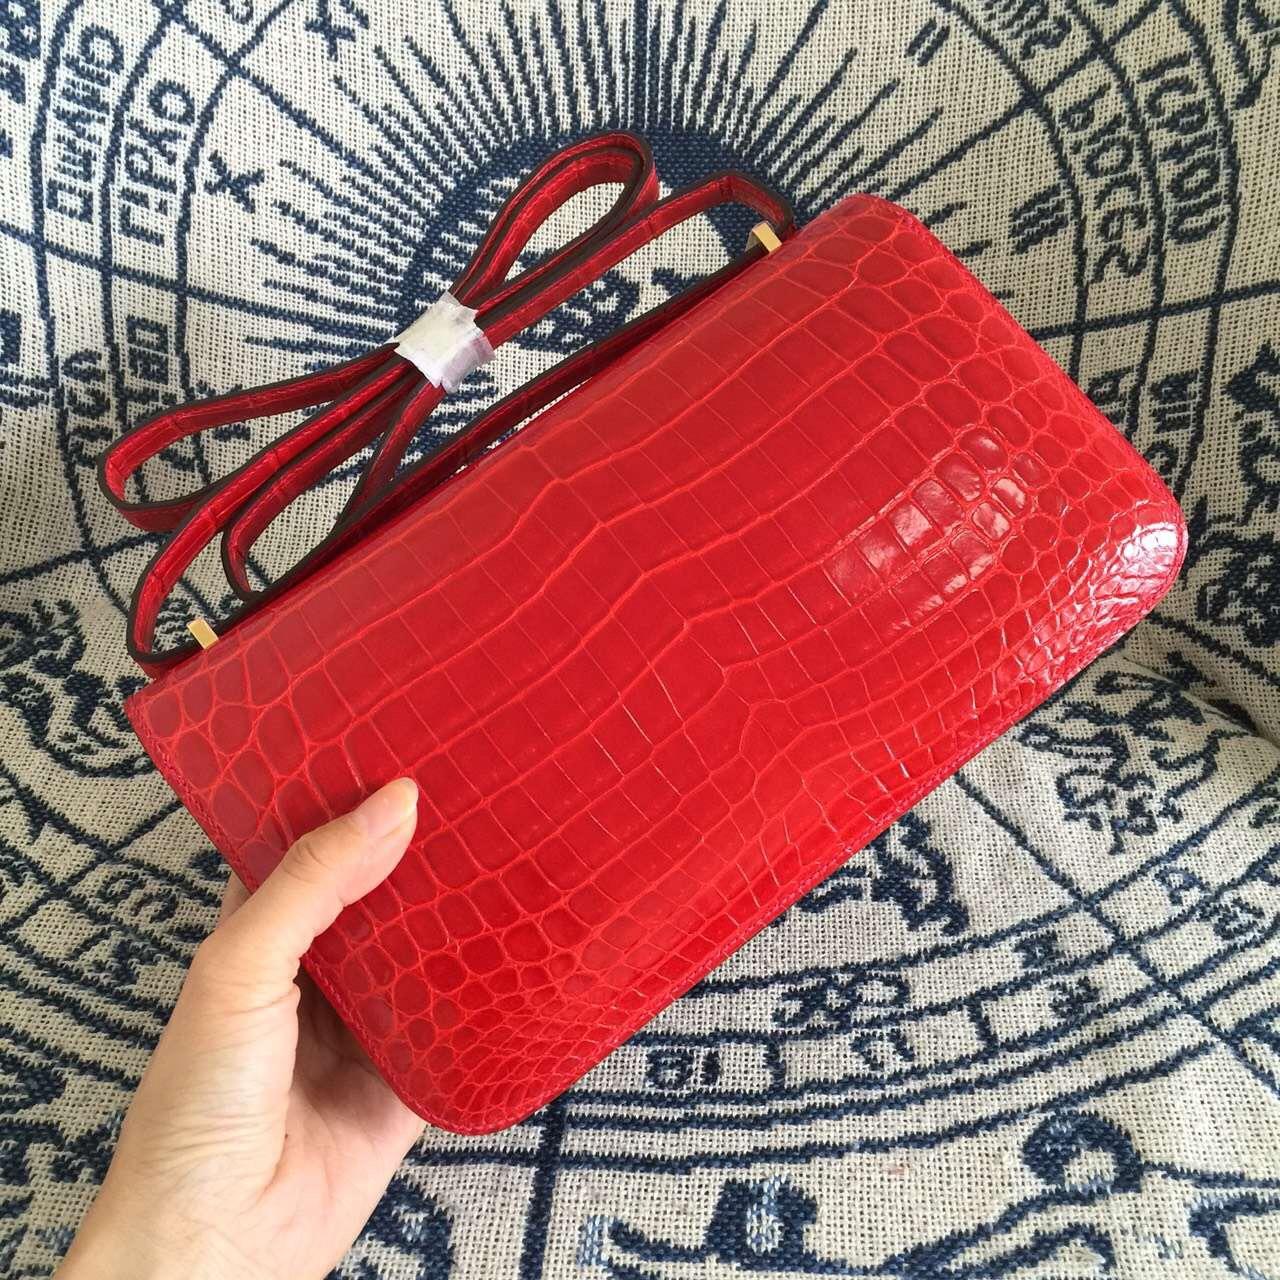 Online Store Hermes Constance26 Crocodile Leather Ferrari Red Women's Bag